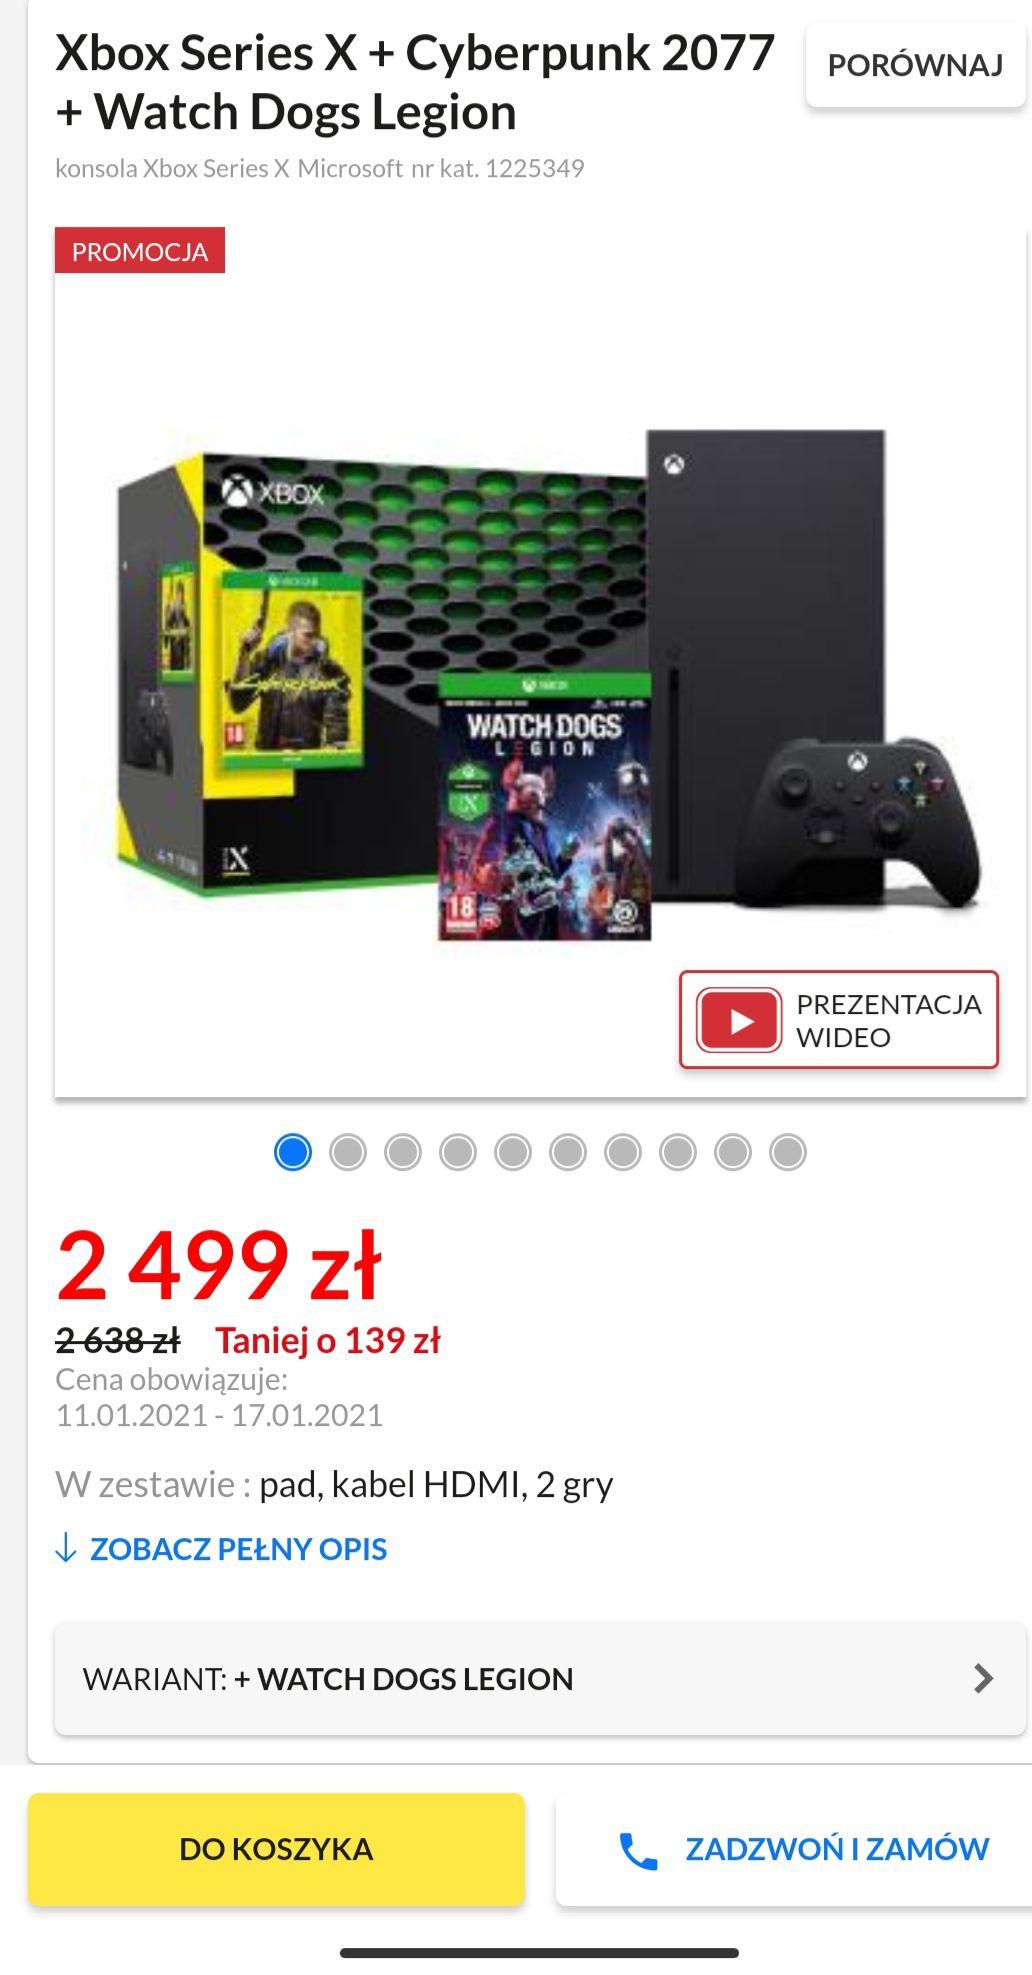 Xbox Series X + Cyberpunk 2077 + Watch Dogs Legion